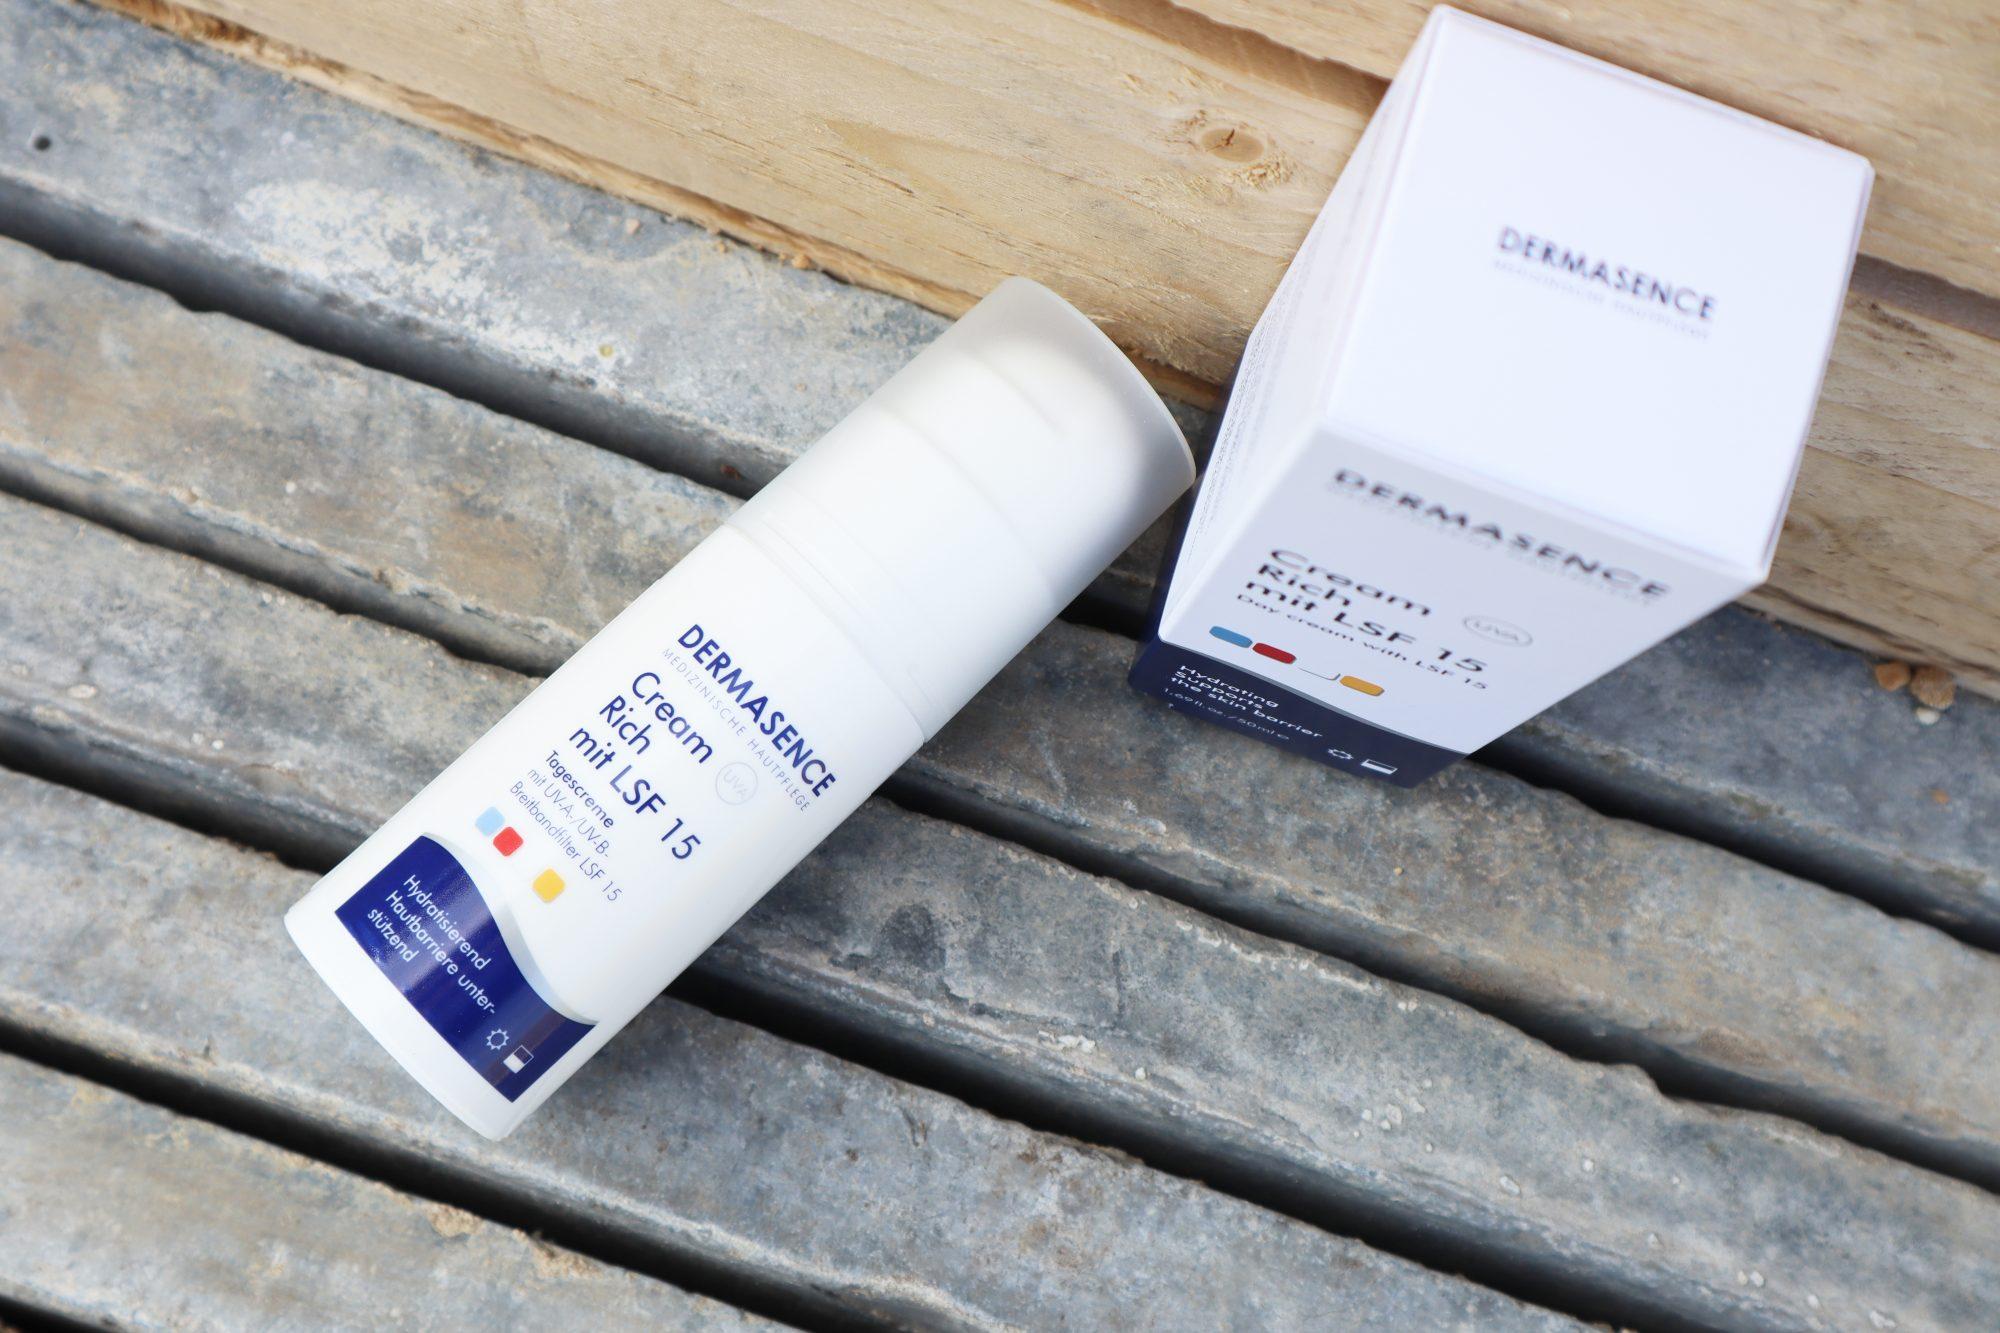 Dermasence Cream Rich LSF15